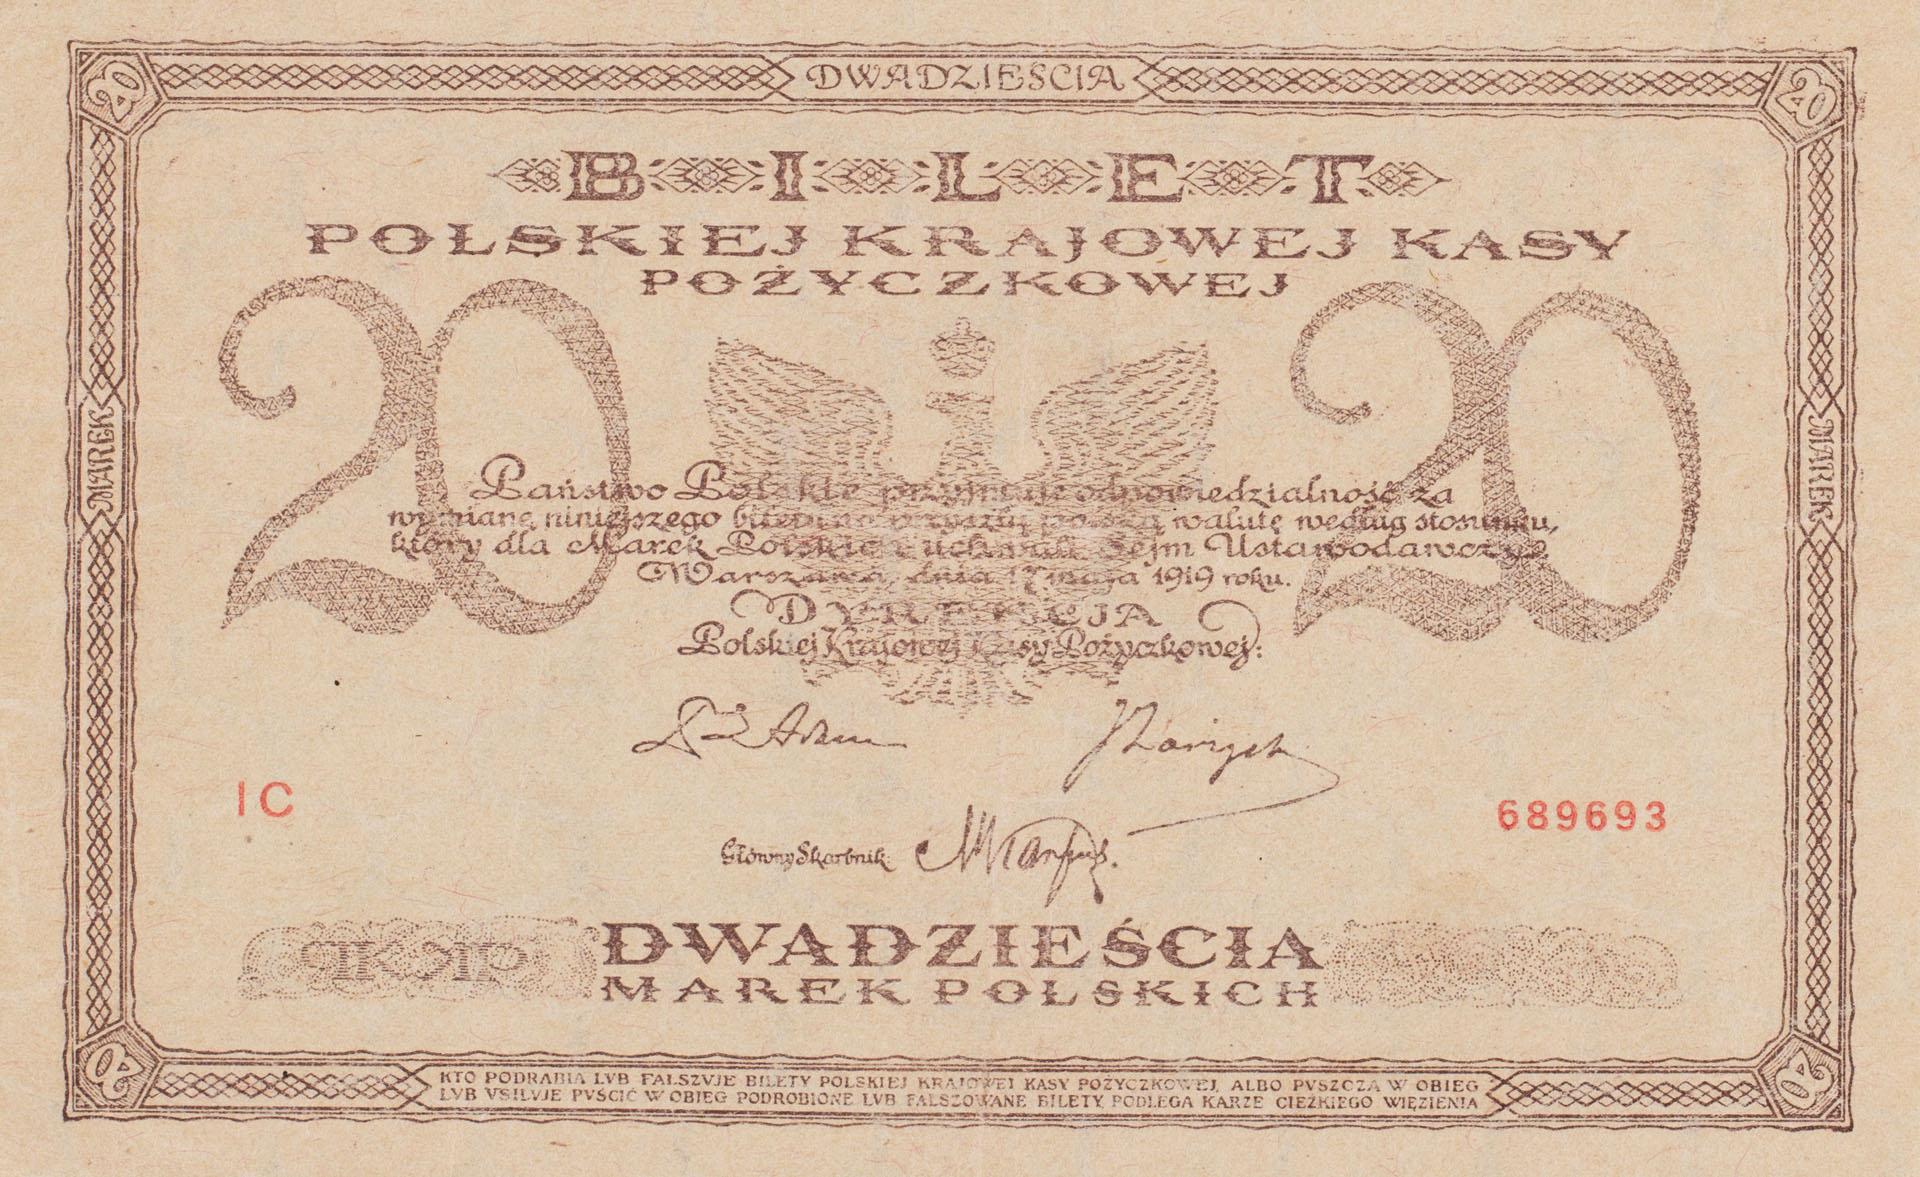 Banknot 20 marek polskich